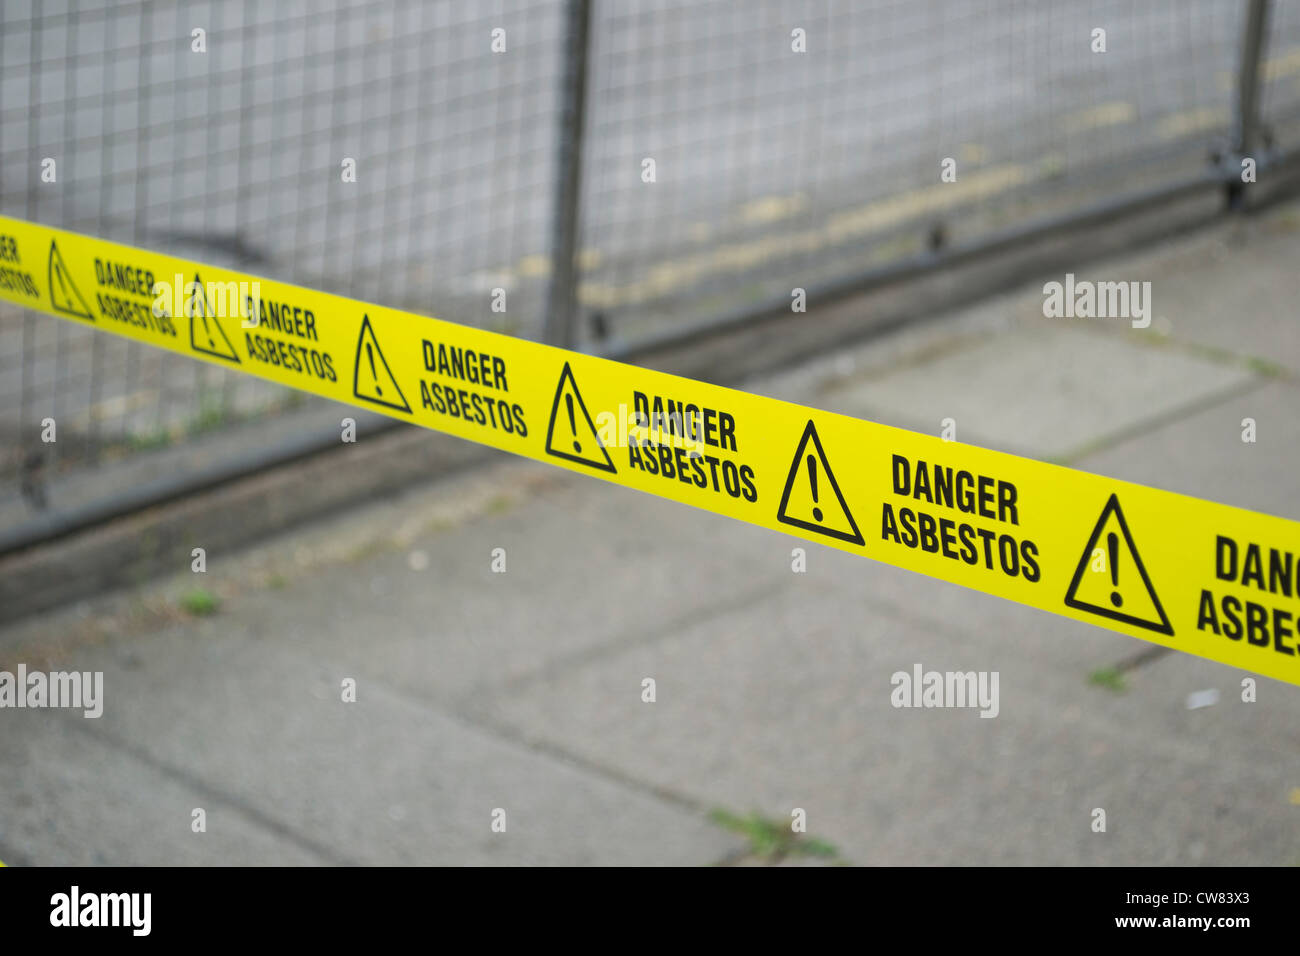 Asbestos precautions. Surrey, England, UK - Stock Image